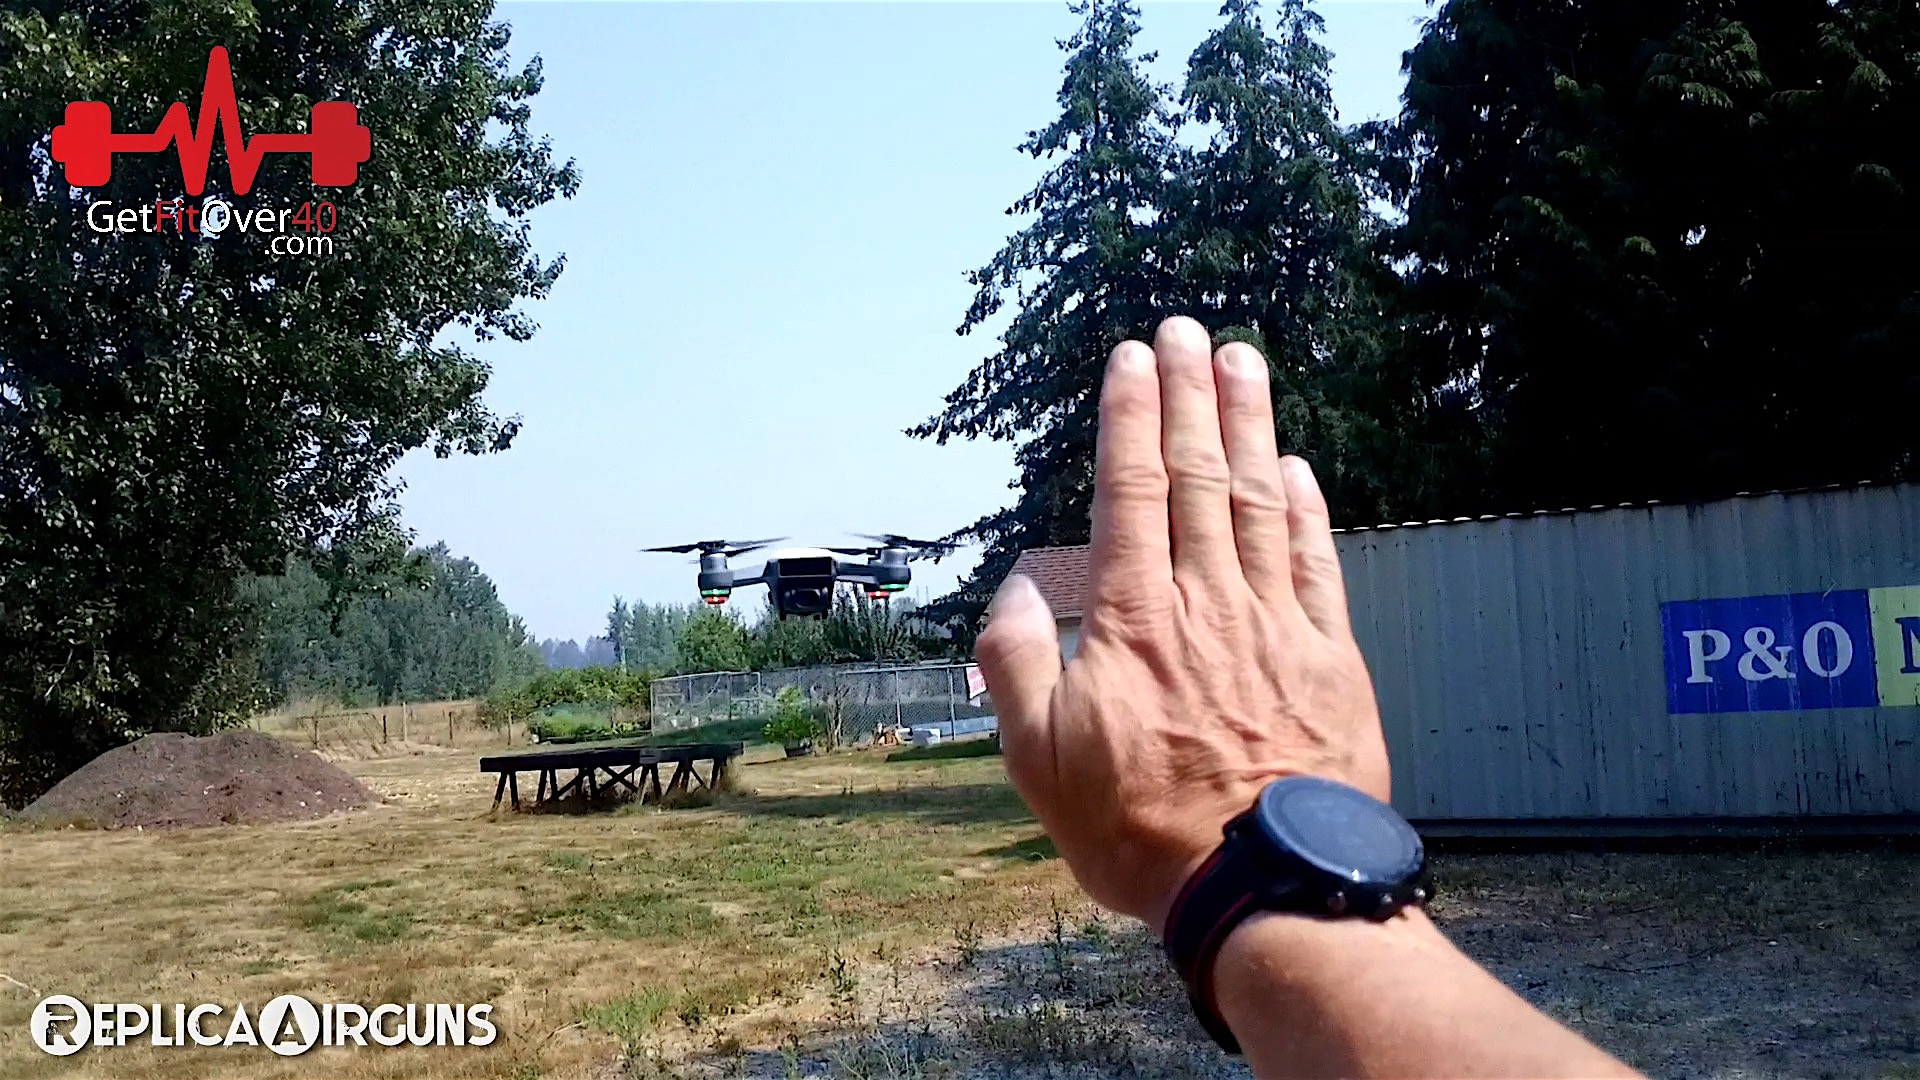 DJI Spark Drone First Field Test Shooting Guns Drone Hand.jpg